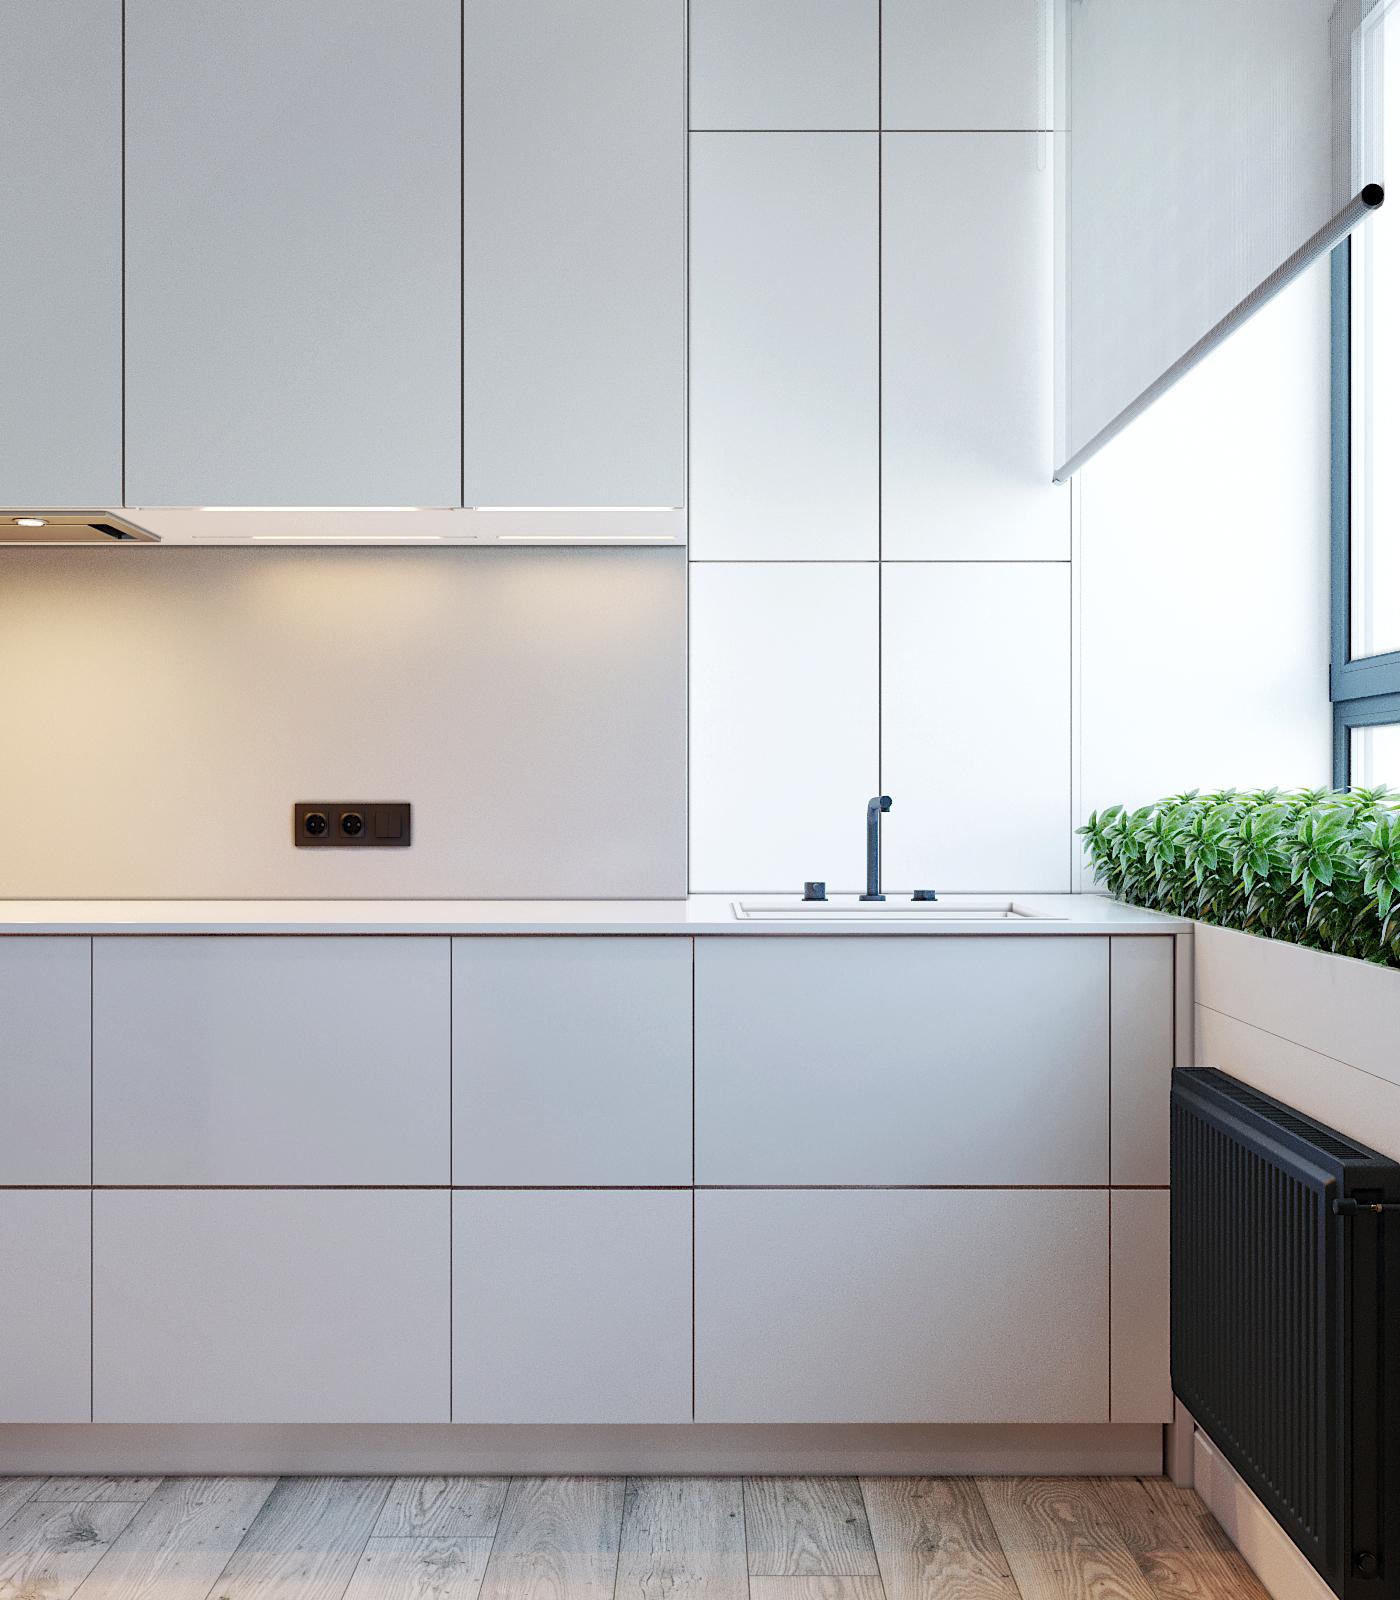 https://avantum-remont.ru/wp-content/uploads/2015/05/Livingroom-Kitchen_Interactive-LightMix_View09.jpg